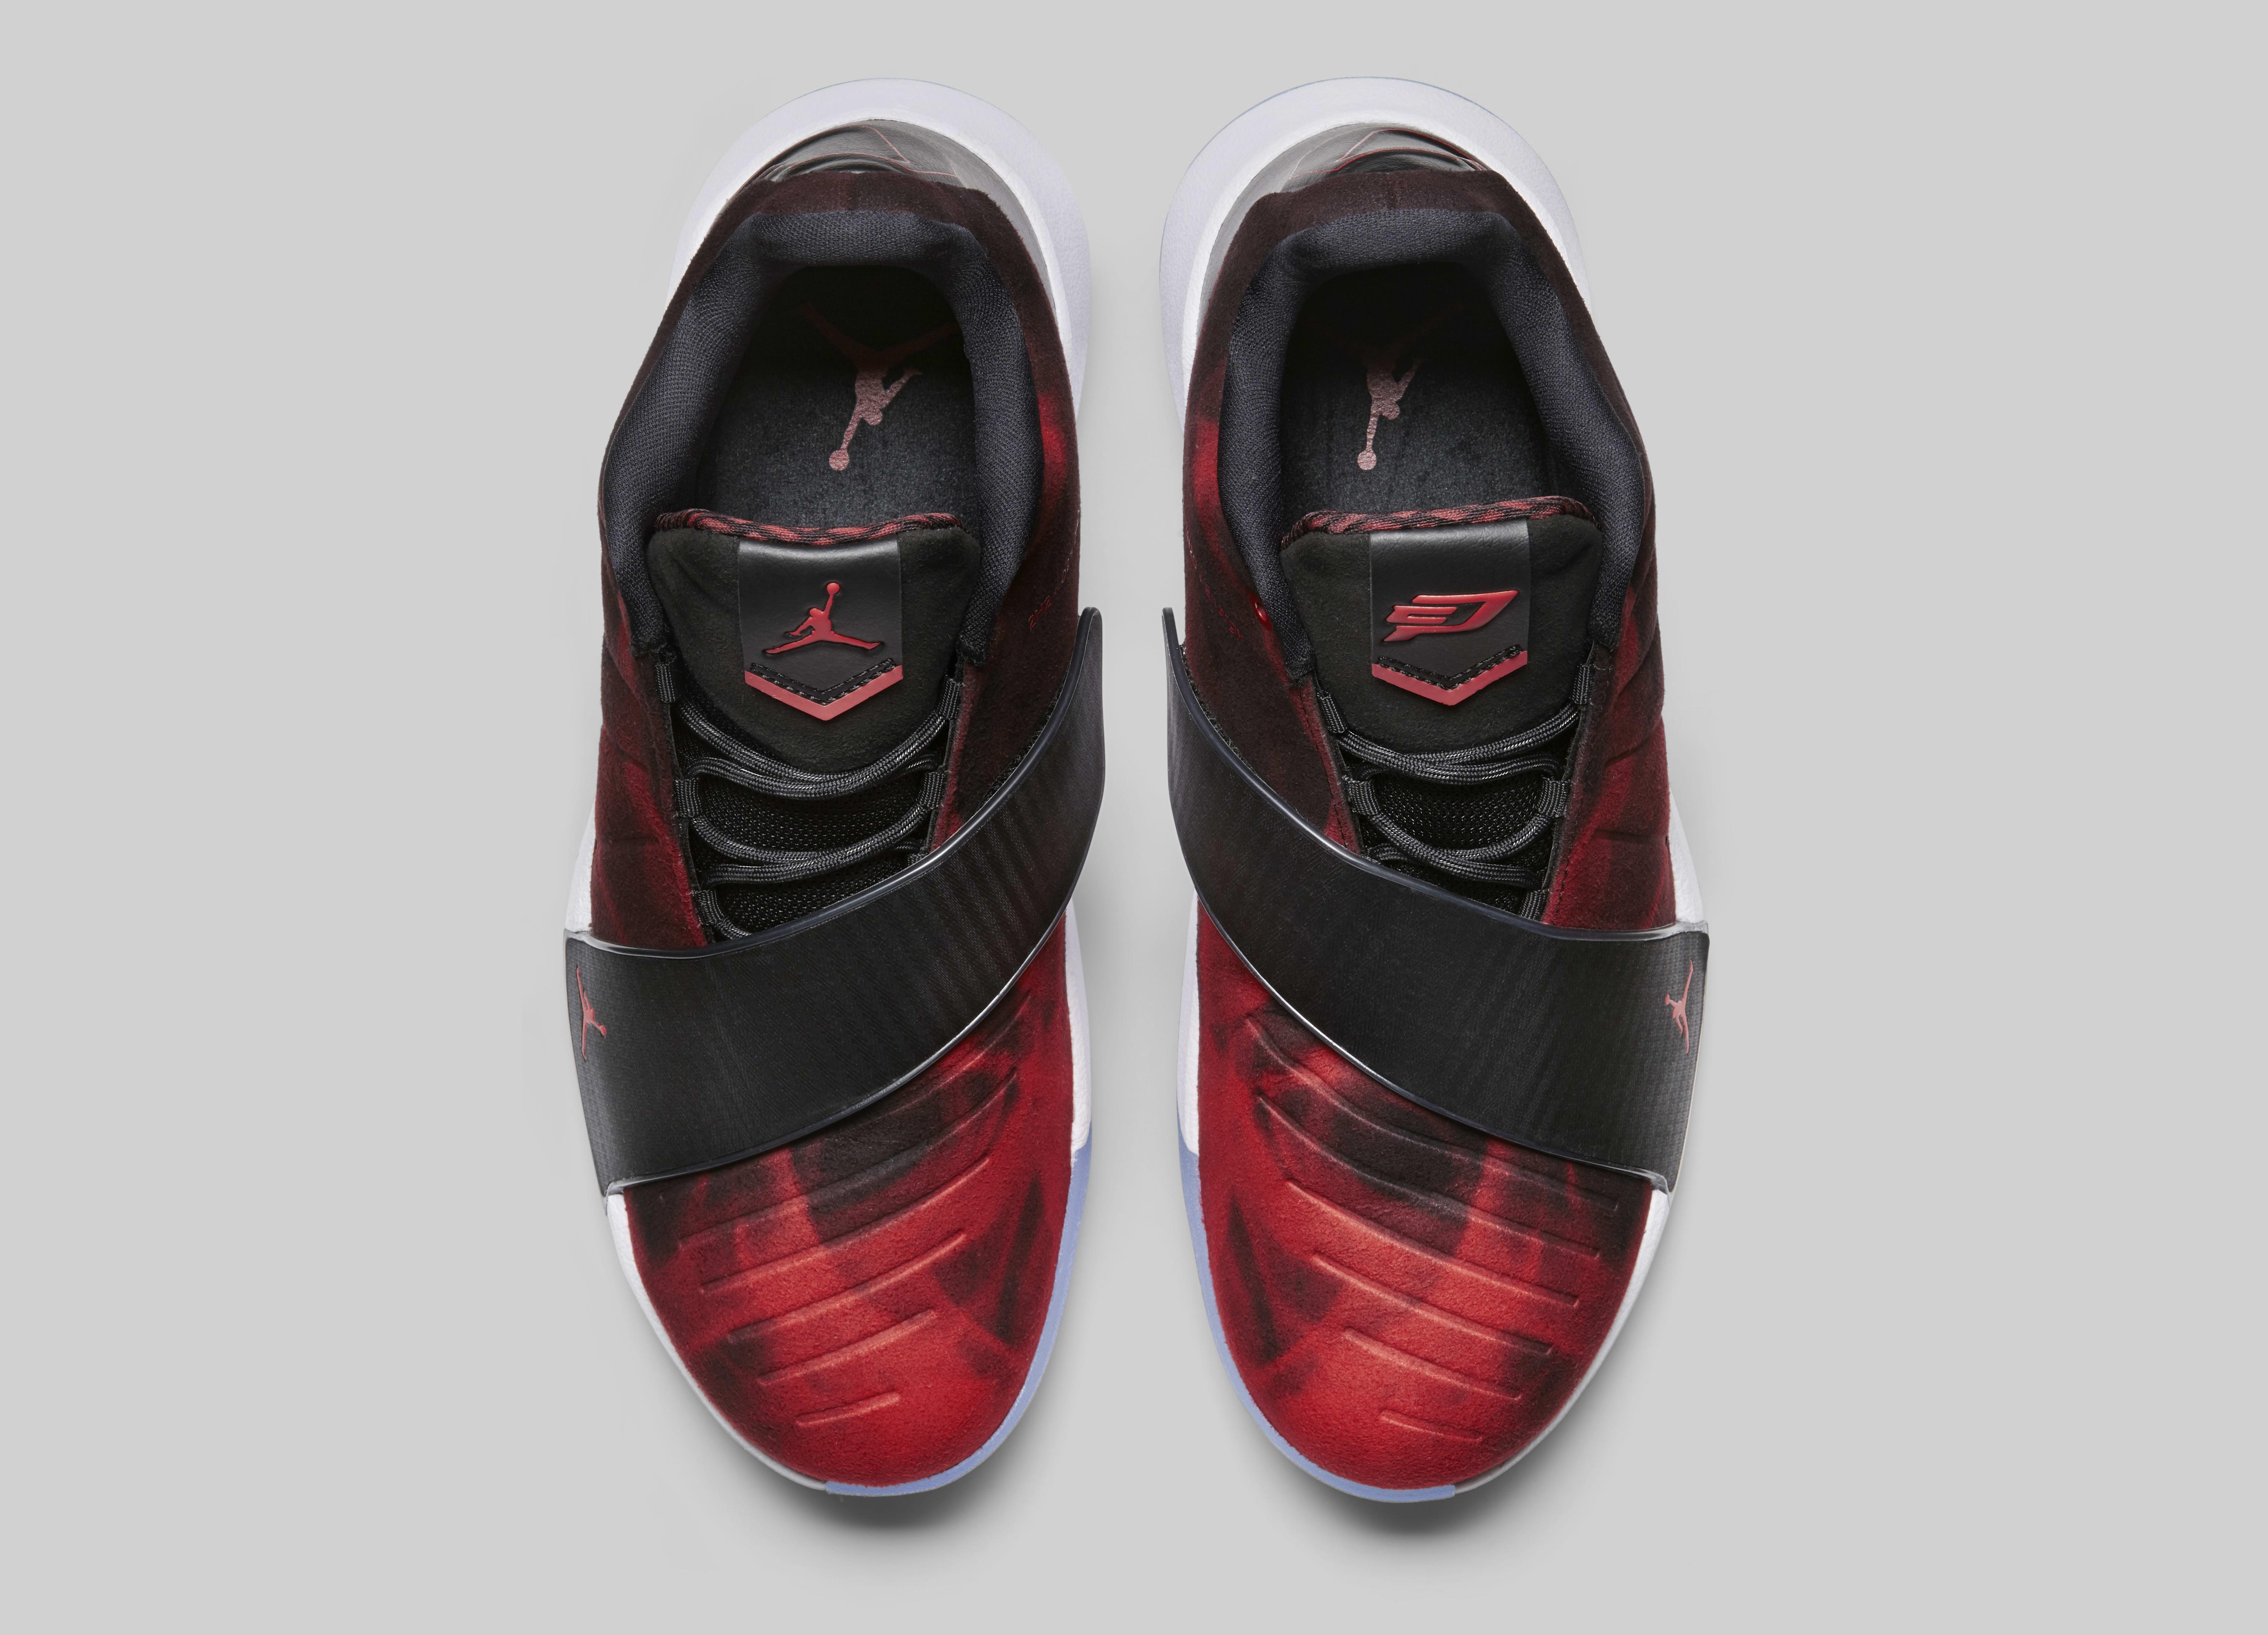 20757b00286f Jordan Brand Is Still Making Signature Shoes for Chris Paul ...